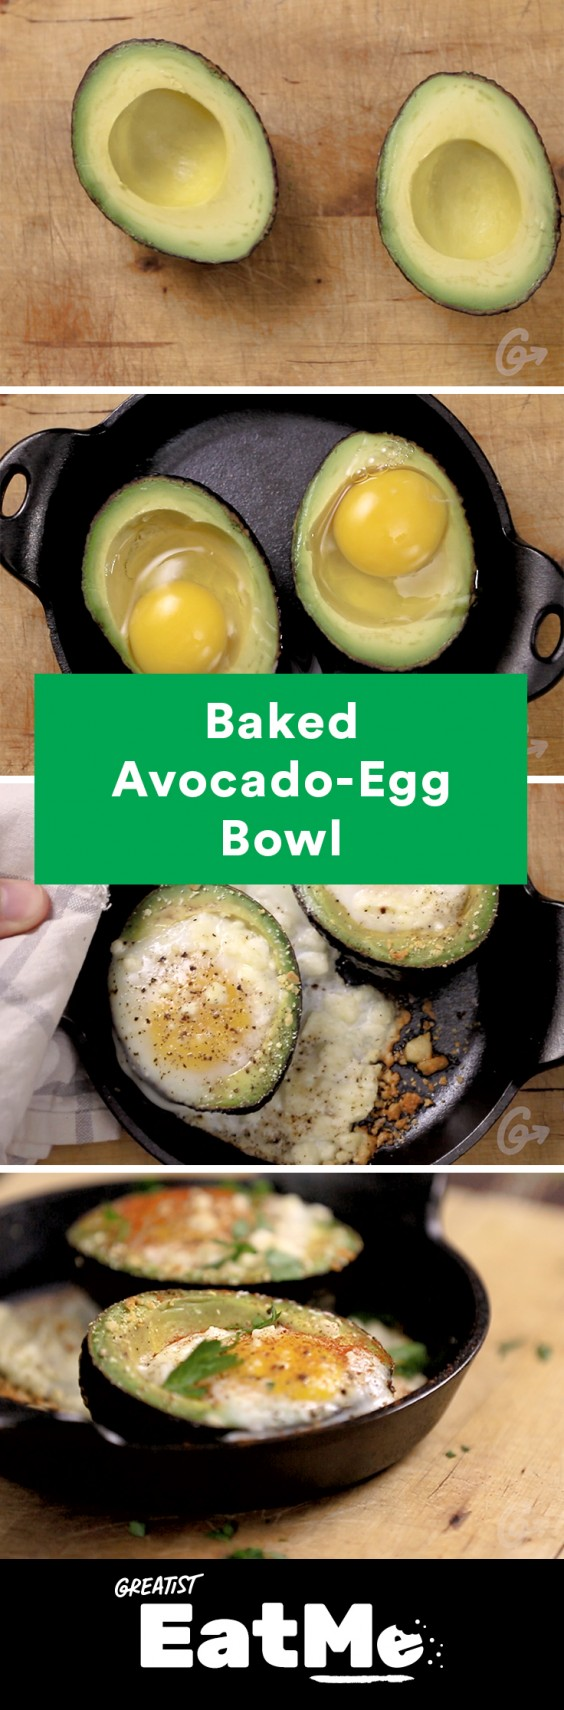 Eat Me Video: Avocado Egg Bowl